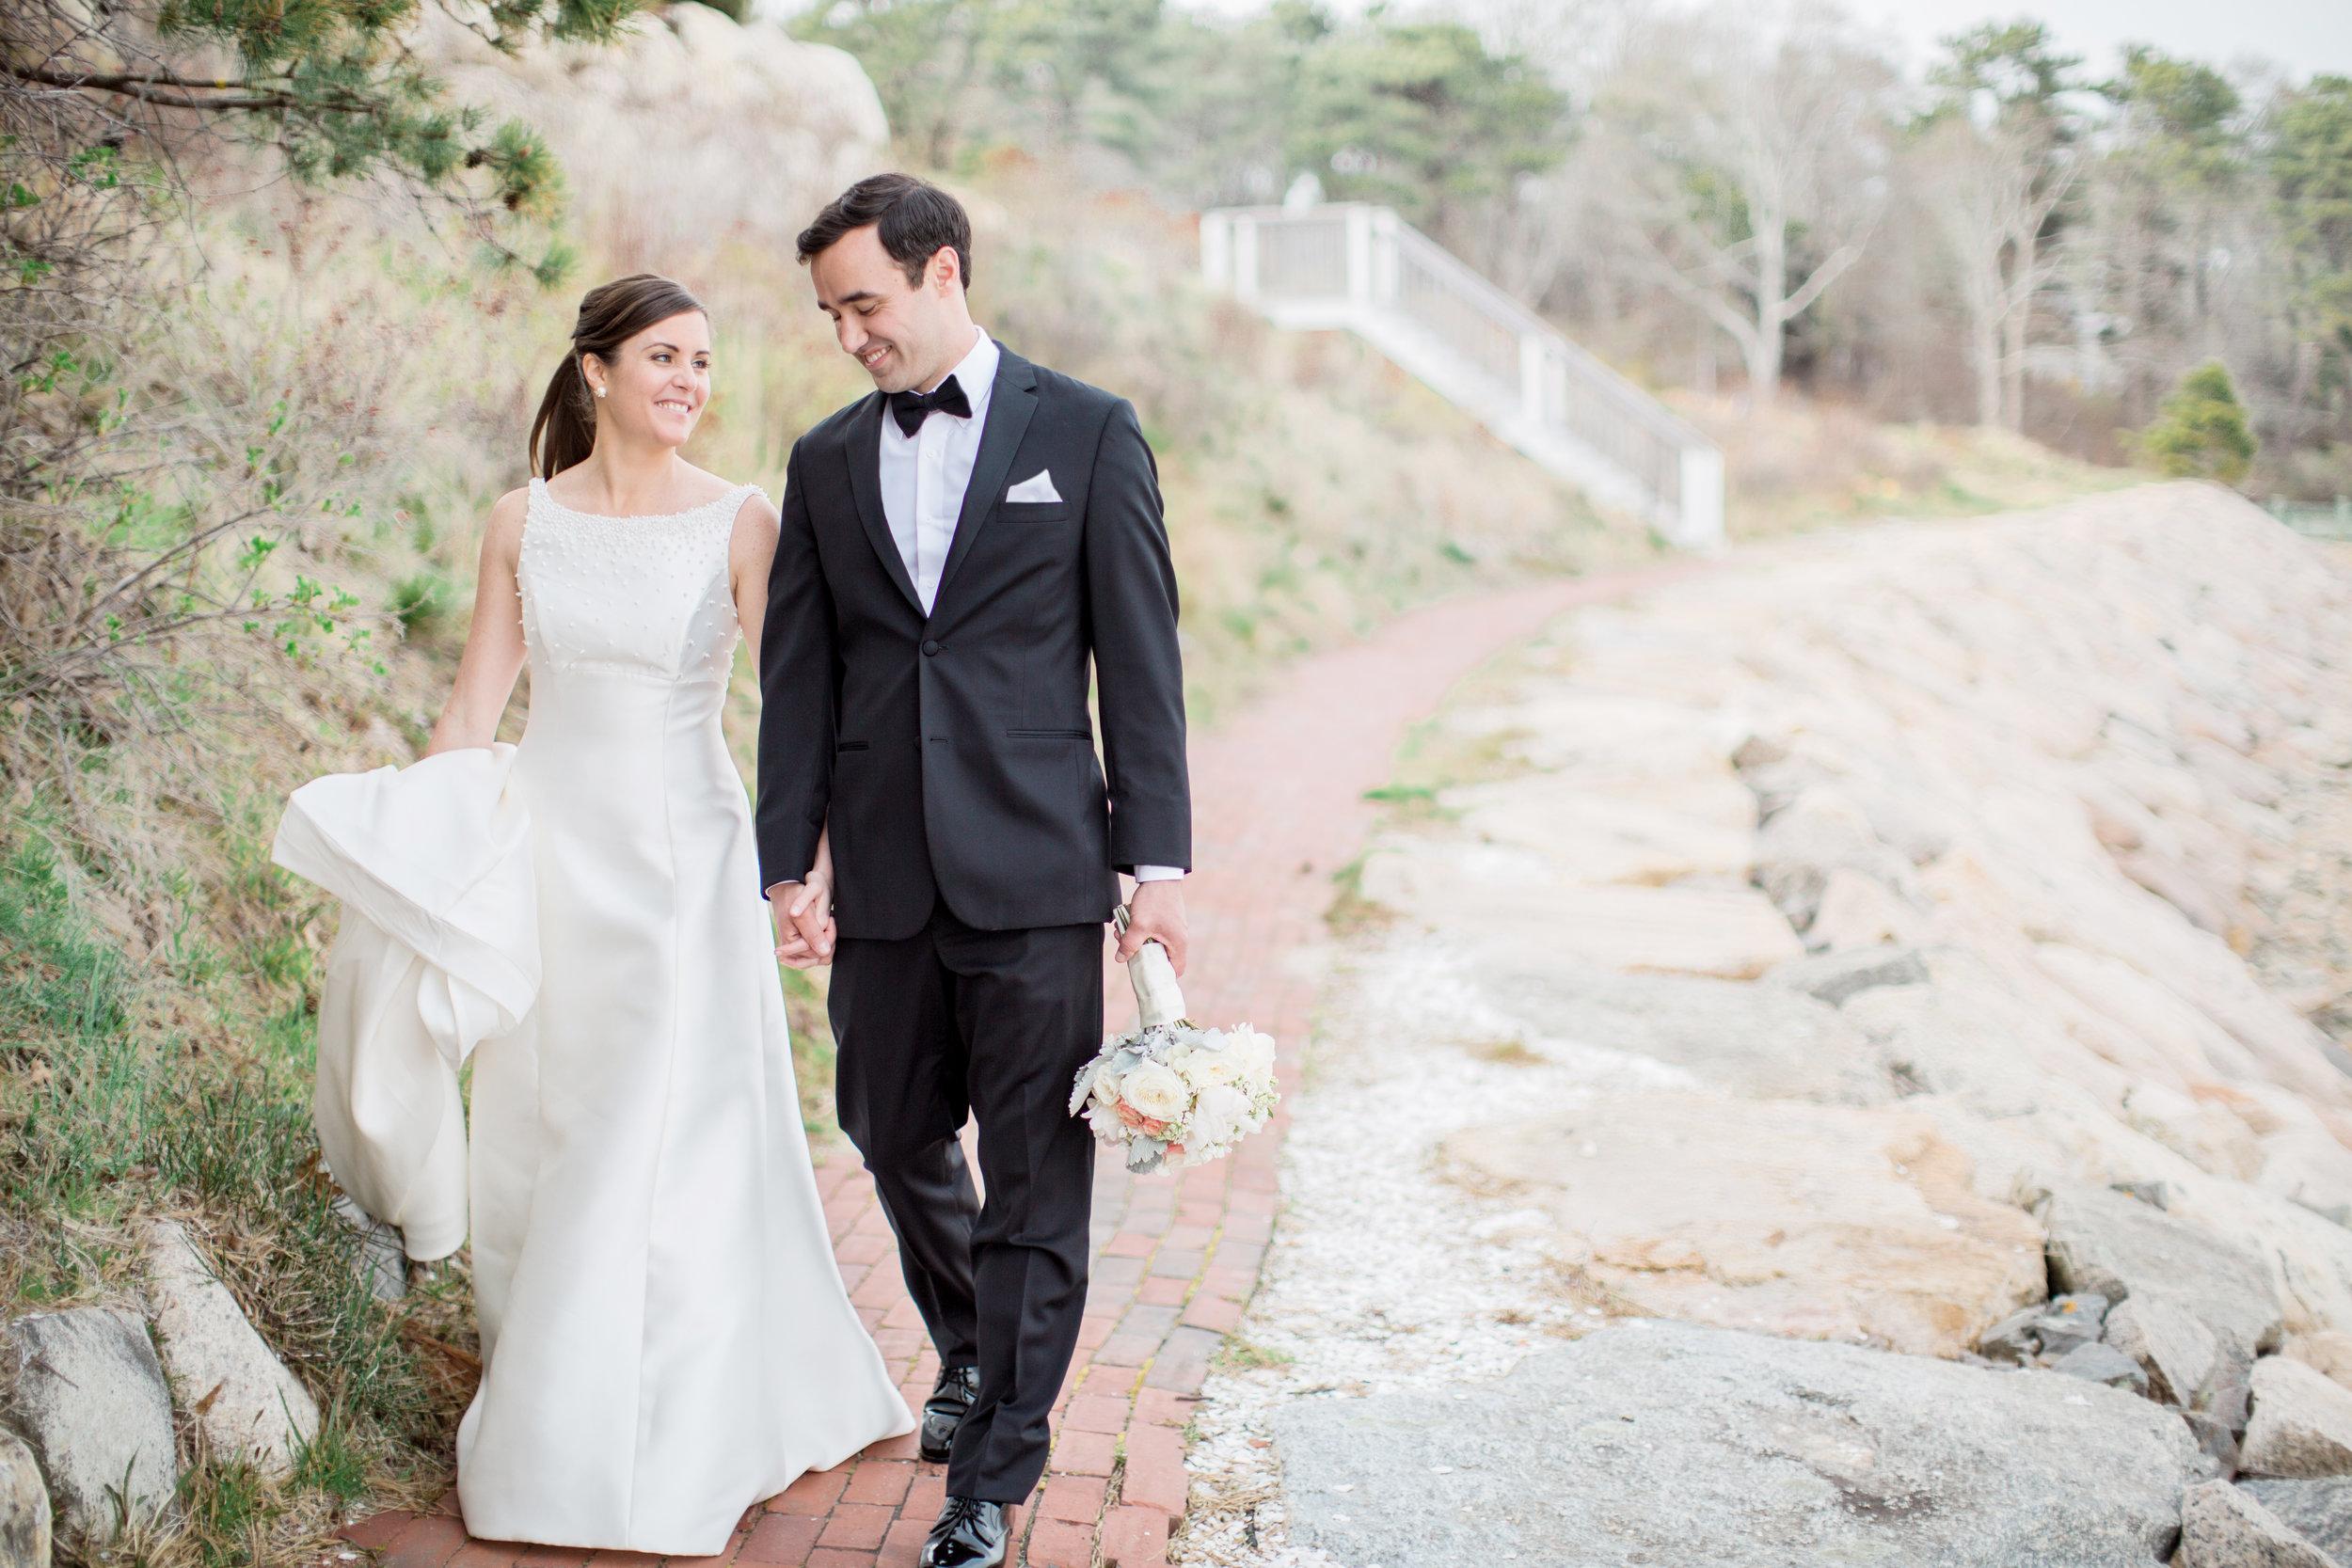 wequassett-boston-cape-cod-wedding-photographer-photo-20.jpg